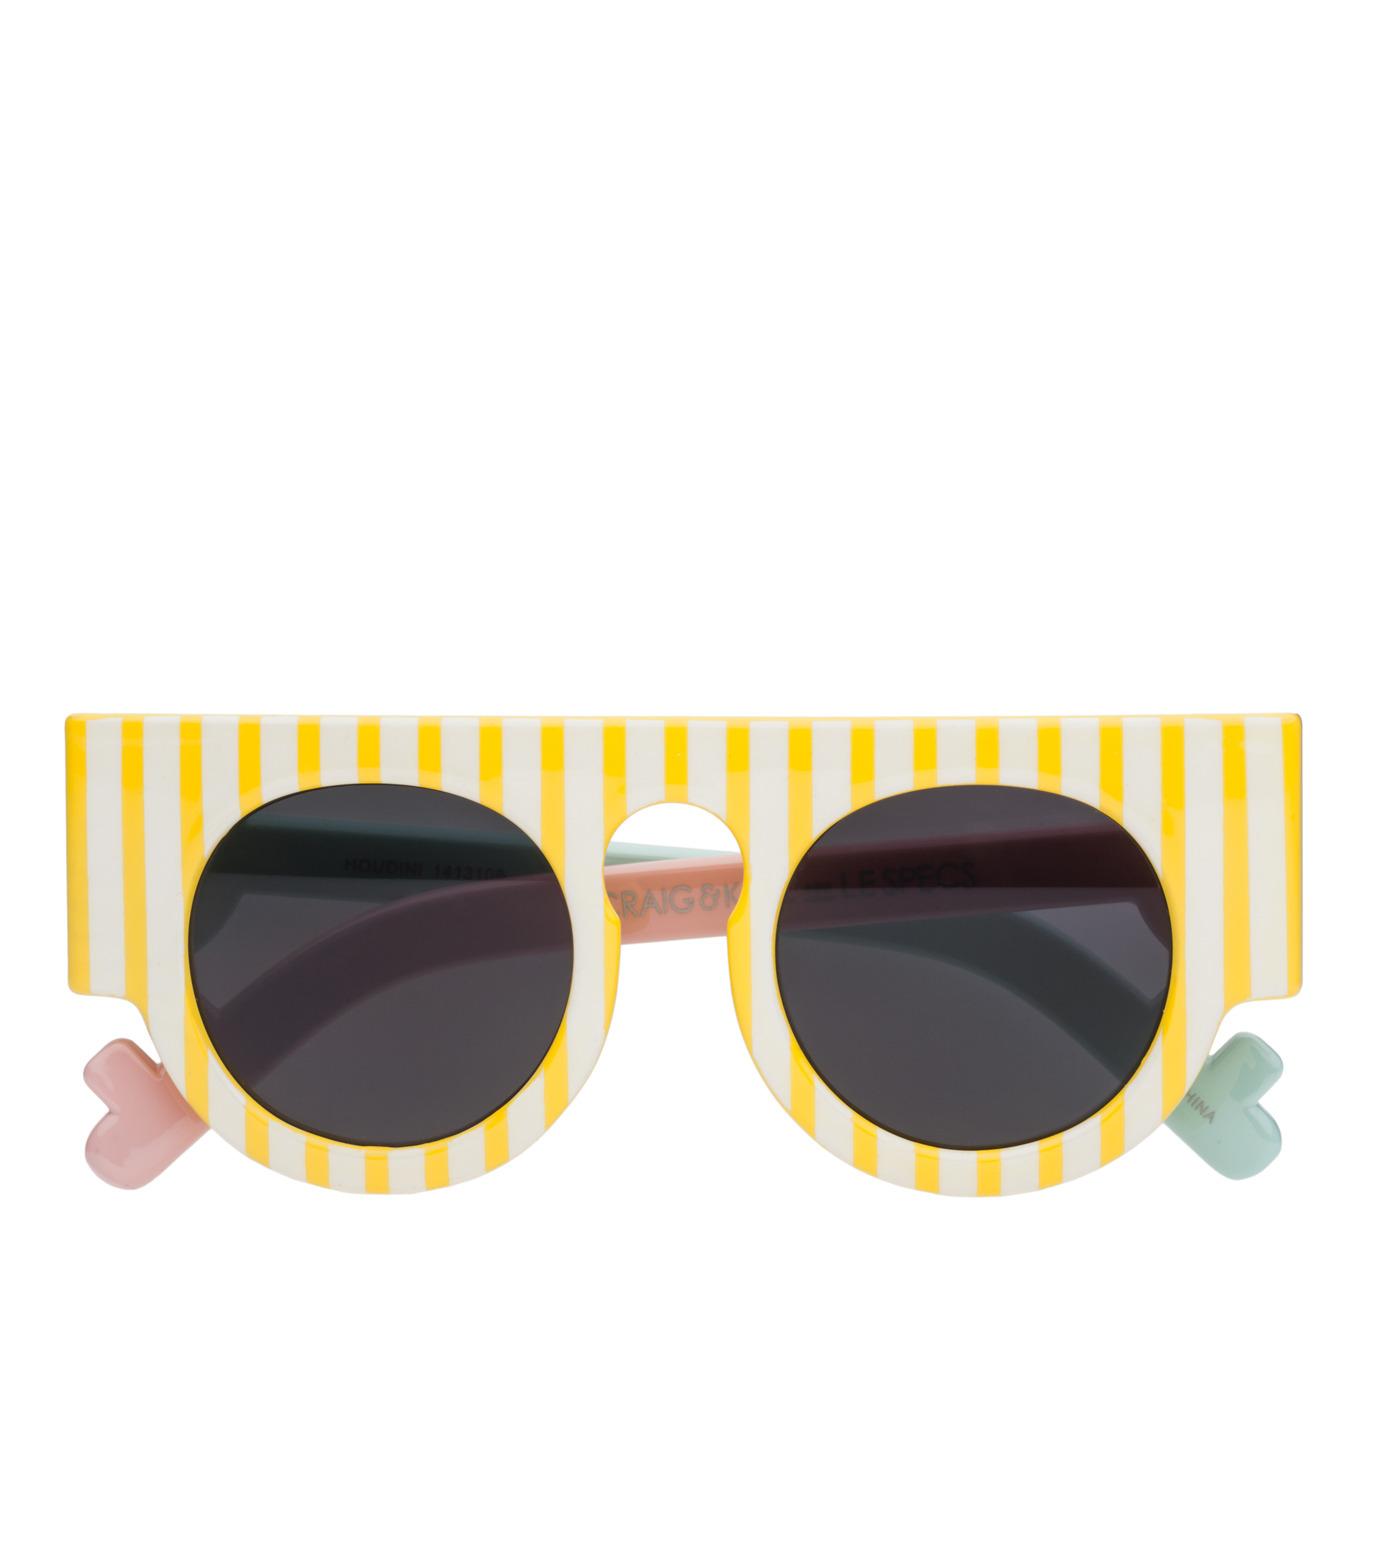 Craig&Karl(クレイグ アンド カール)のHoudini Gloss Yellow Stripe-YELLOW(アイウェア/eyewear)-LCK1413108-32 拡大詳細画像2